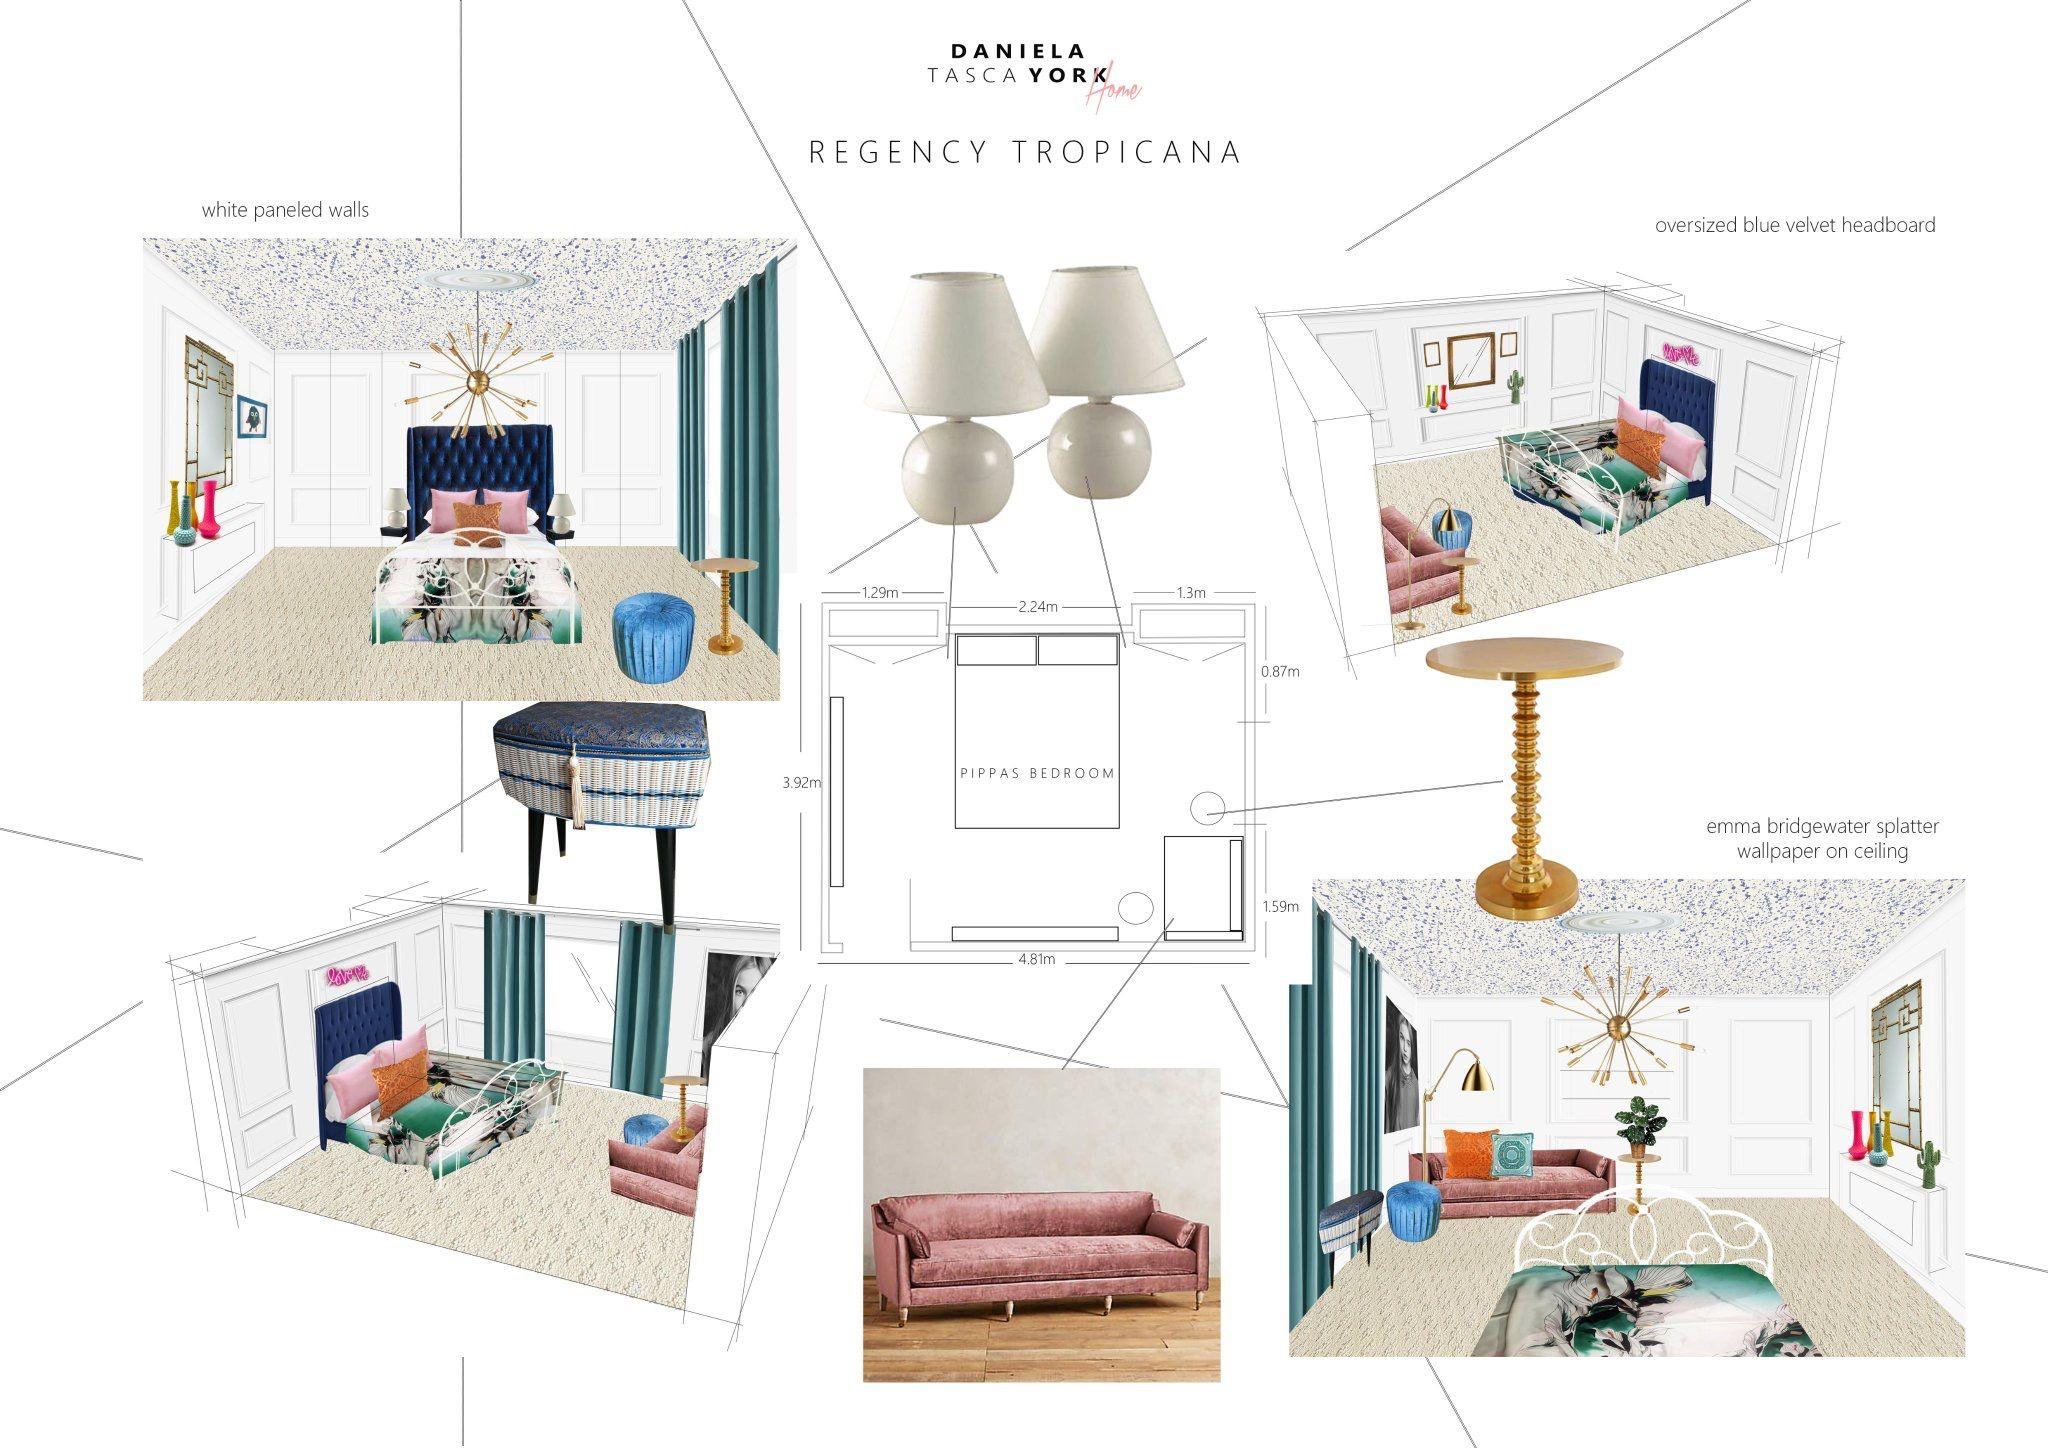 Daniela Tasha York 2017 Great Interior Design Challenge Winner Regency Tropicana Moodboard Room Blue Velvet Headboard Velvet Headboard